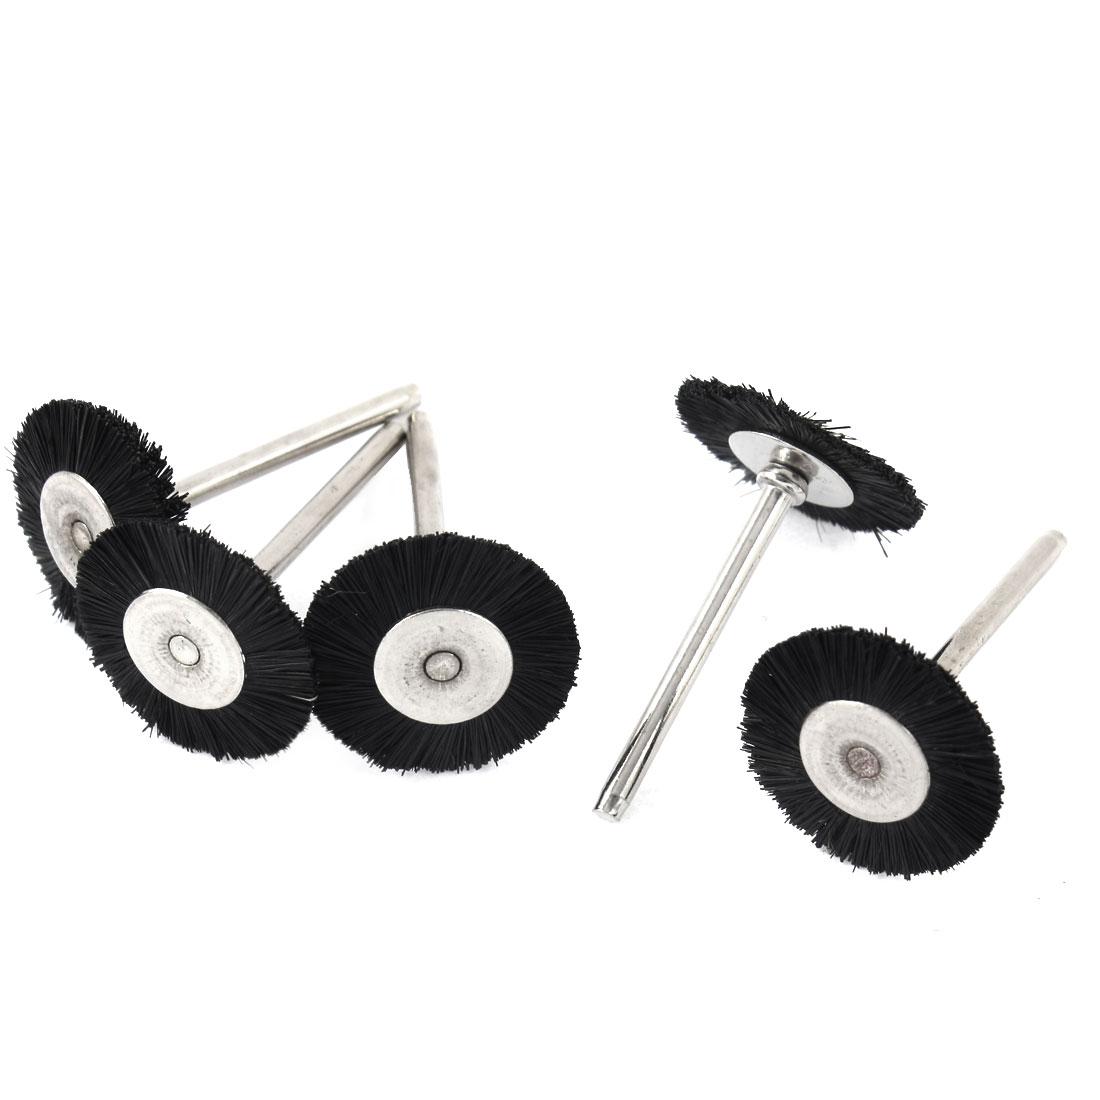 5 Pcs 3mm Shank 25mm Flat Nylon Bristle Wheel Brush Rotary Tool